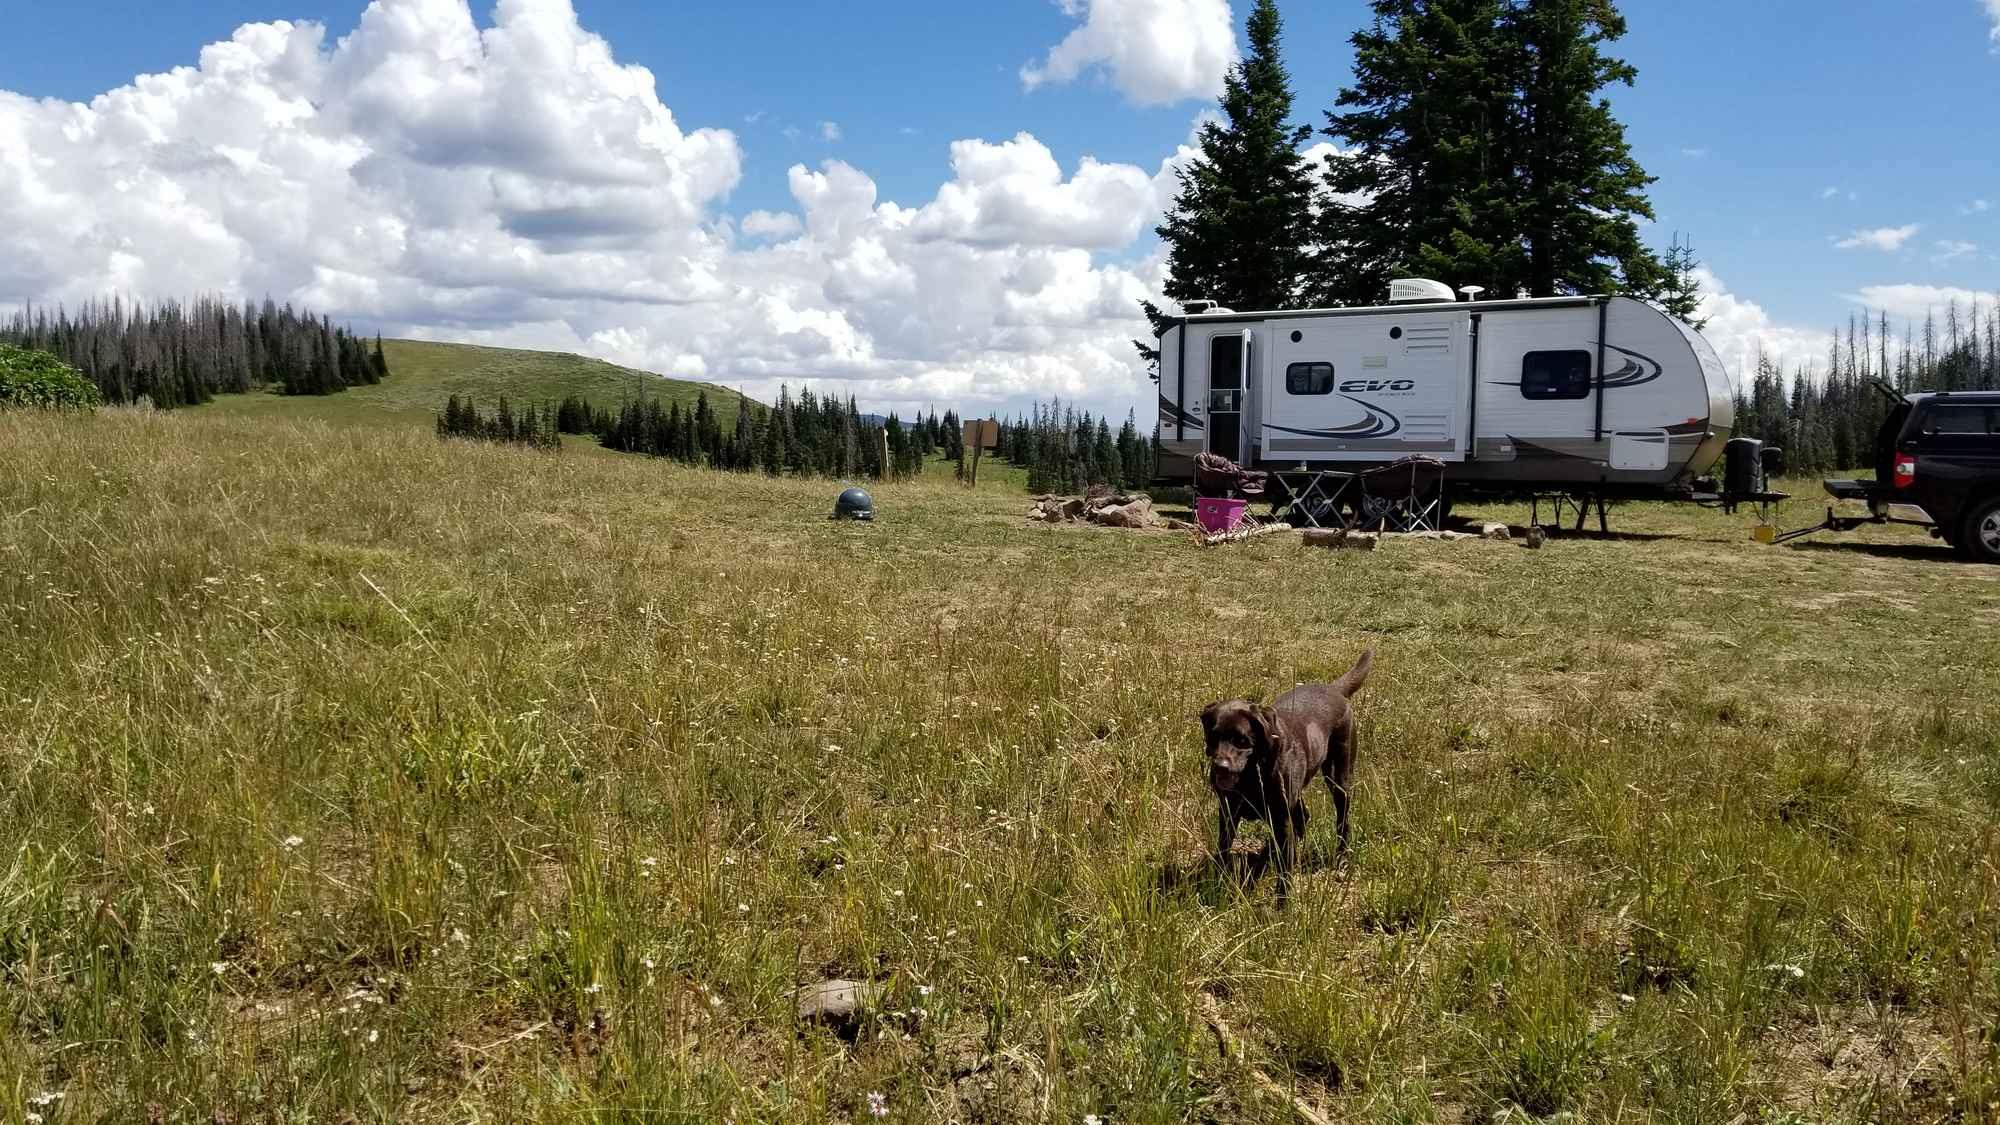 Boondocking on Duchesne Ridge, Utah